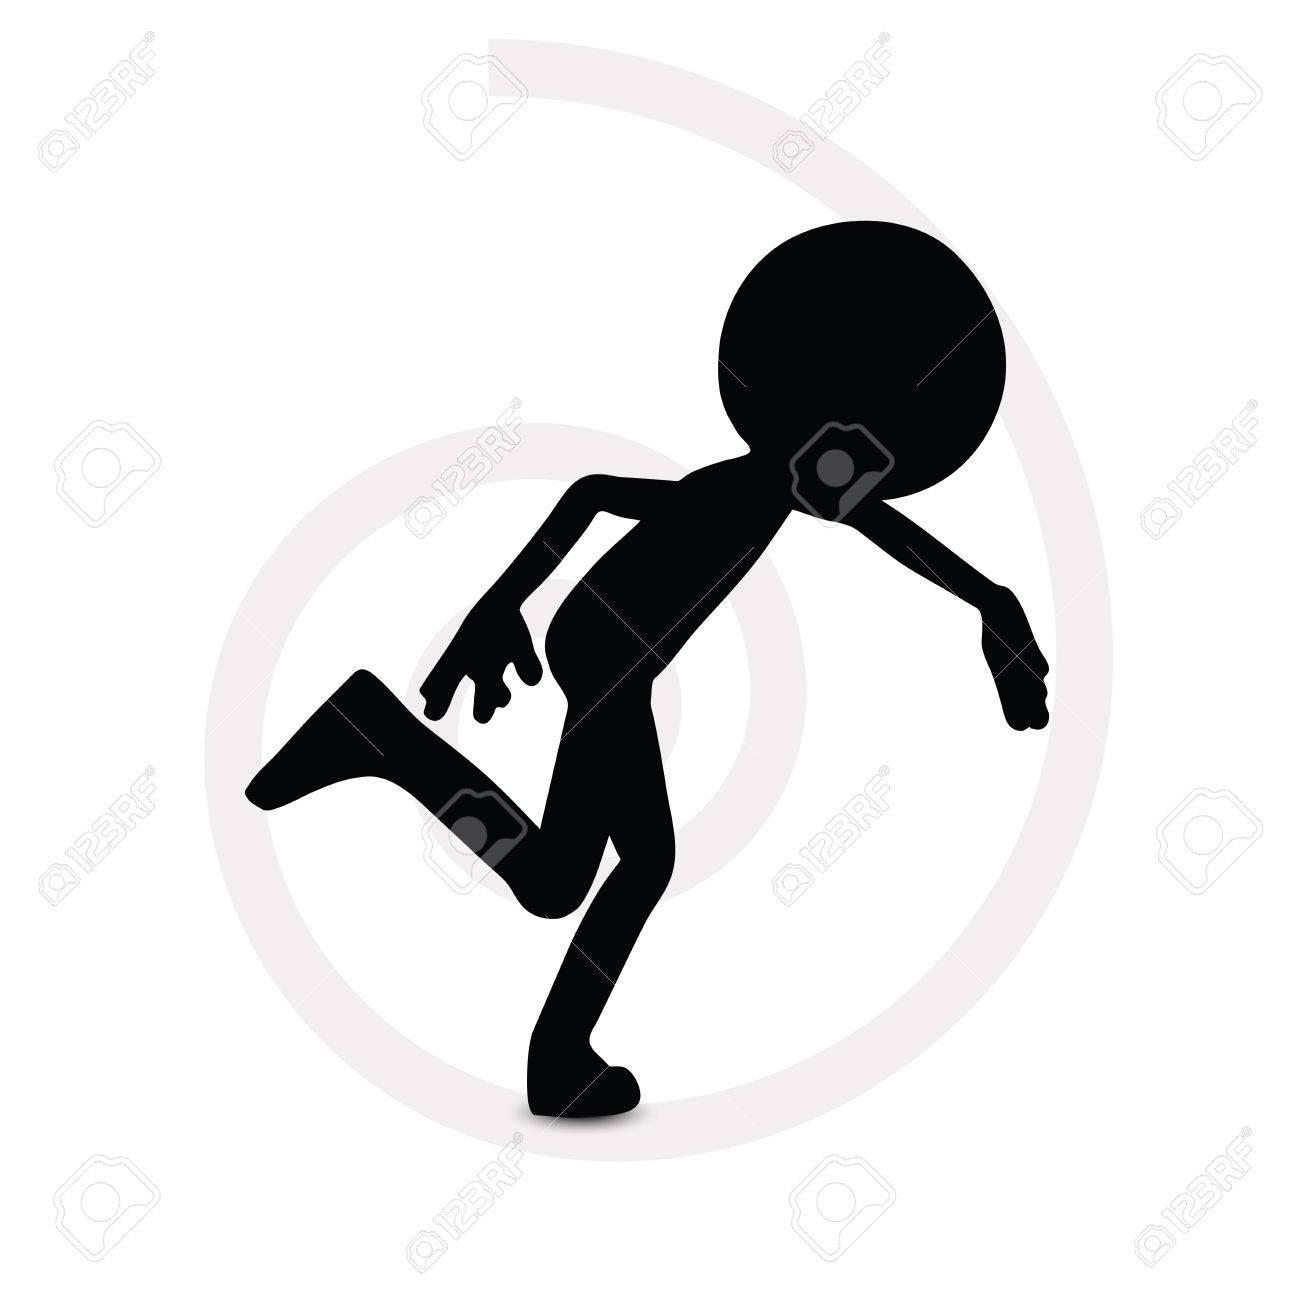 3d man in running pose Stock Vector - 29984234